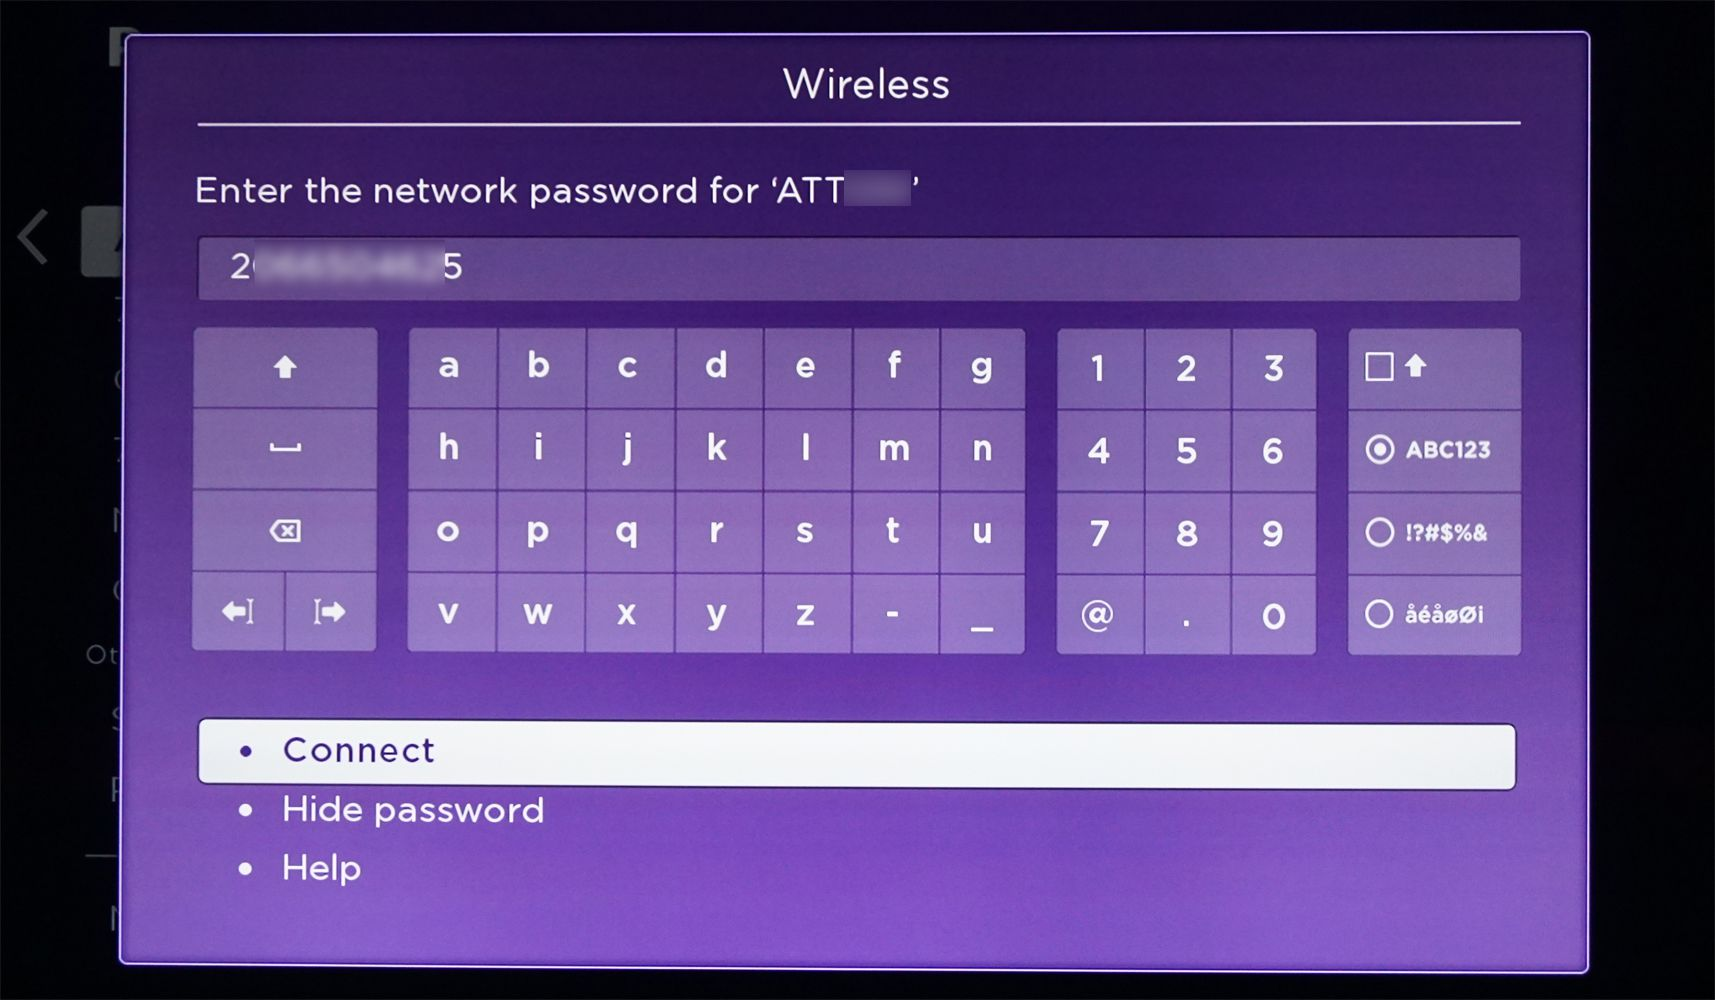 Roku Soundbar – Enter Network Password/Connect